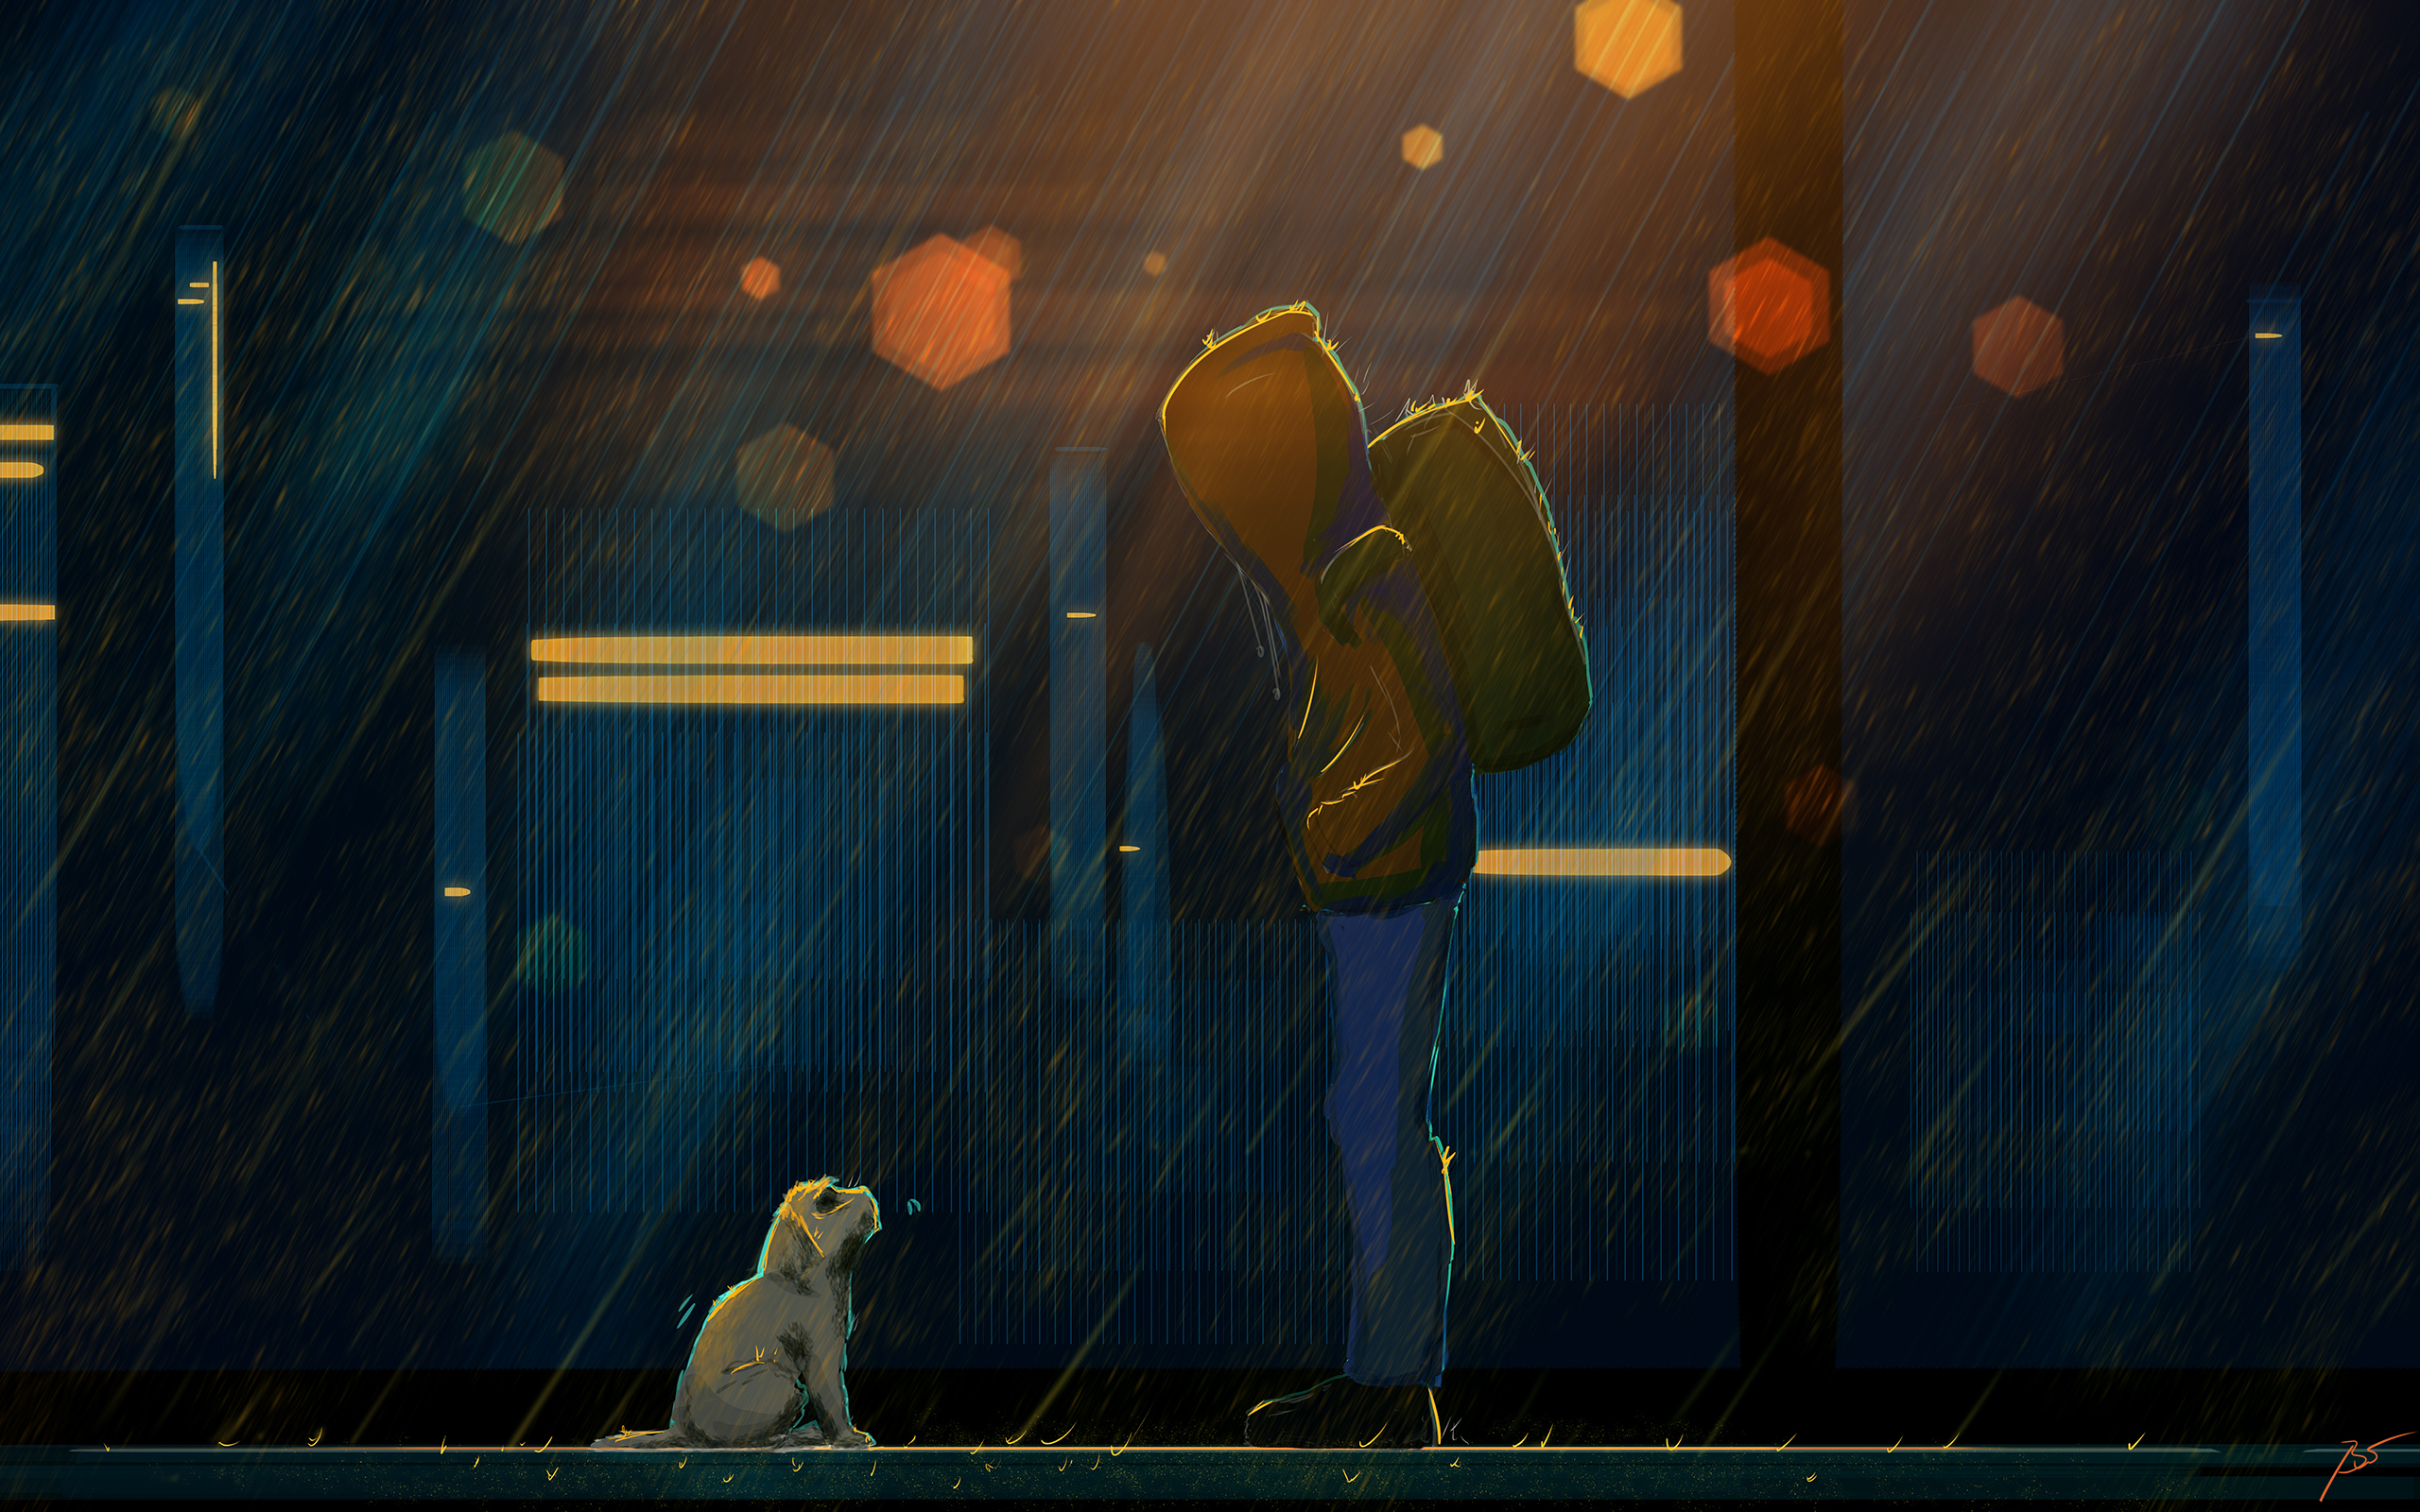 Boy Dog Rain Sad Wallpaper Resolution 2560x1600 Id 1049151 Wallha Com